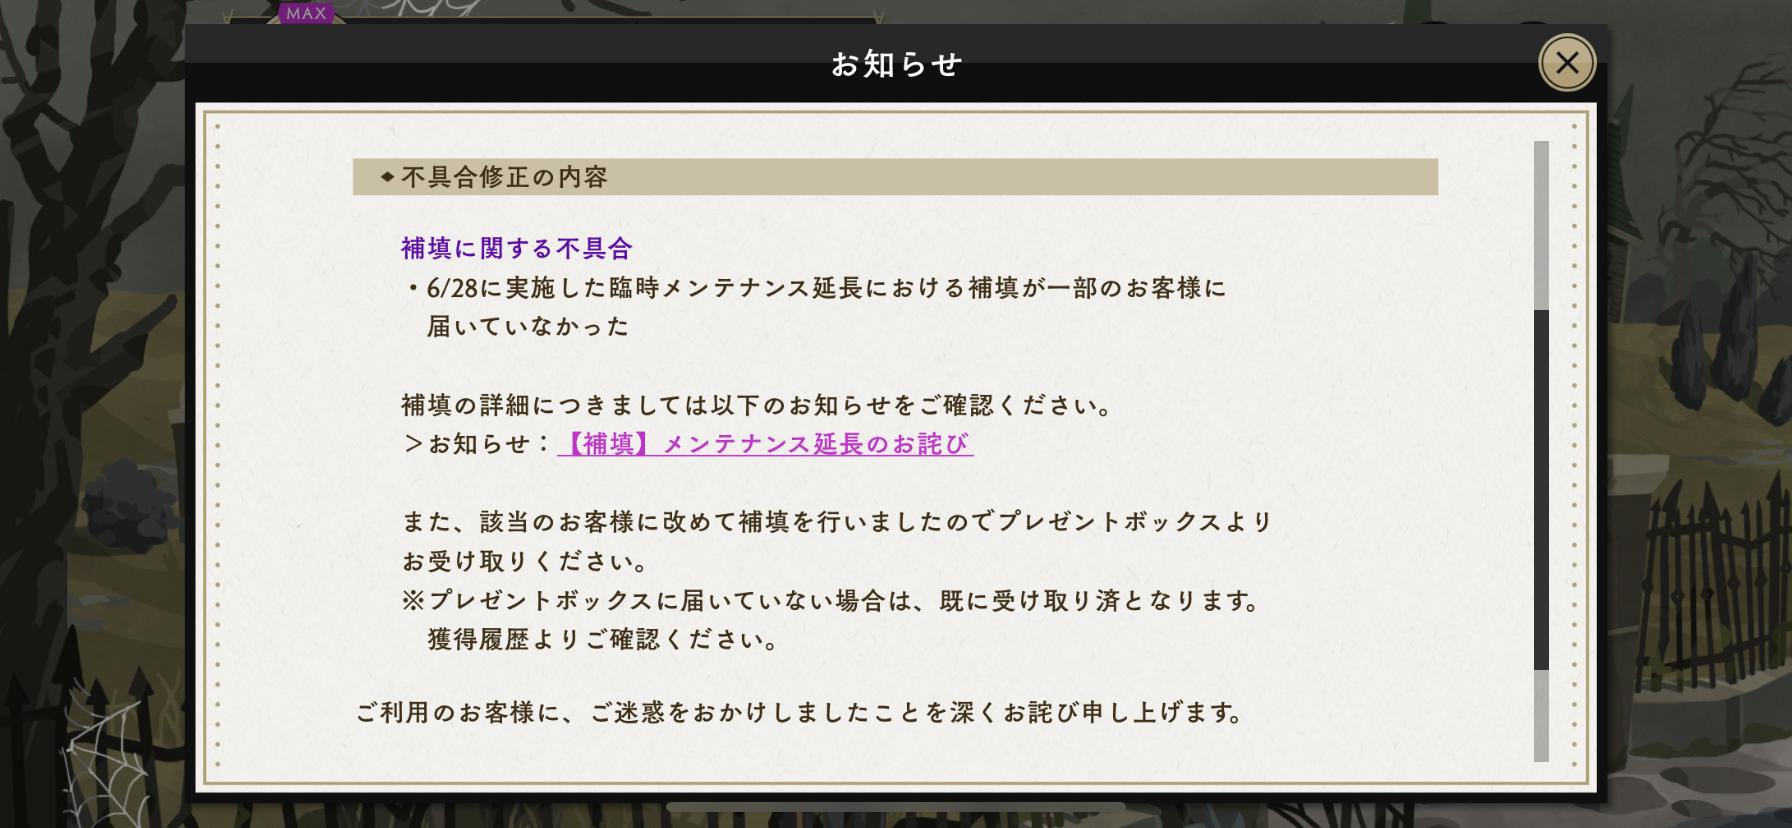 f:id:motimoti444:20210702012354p:plain